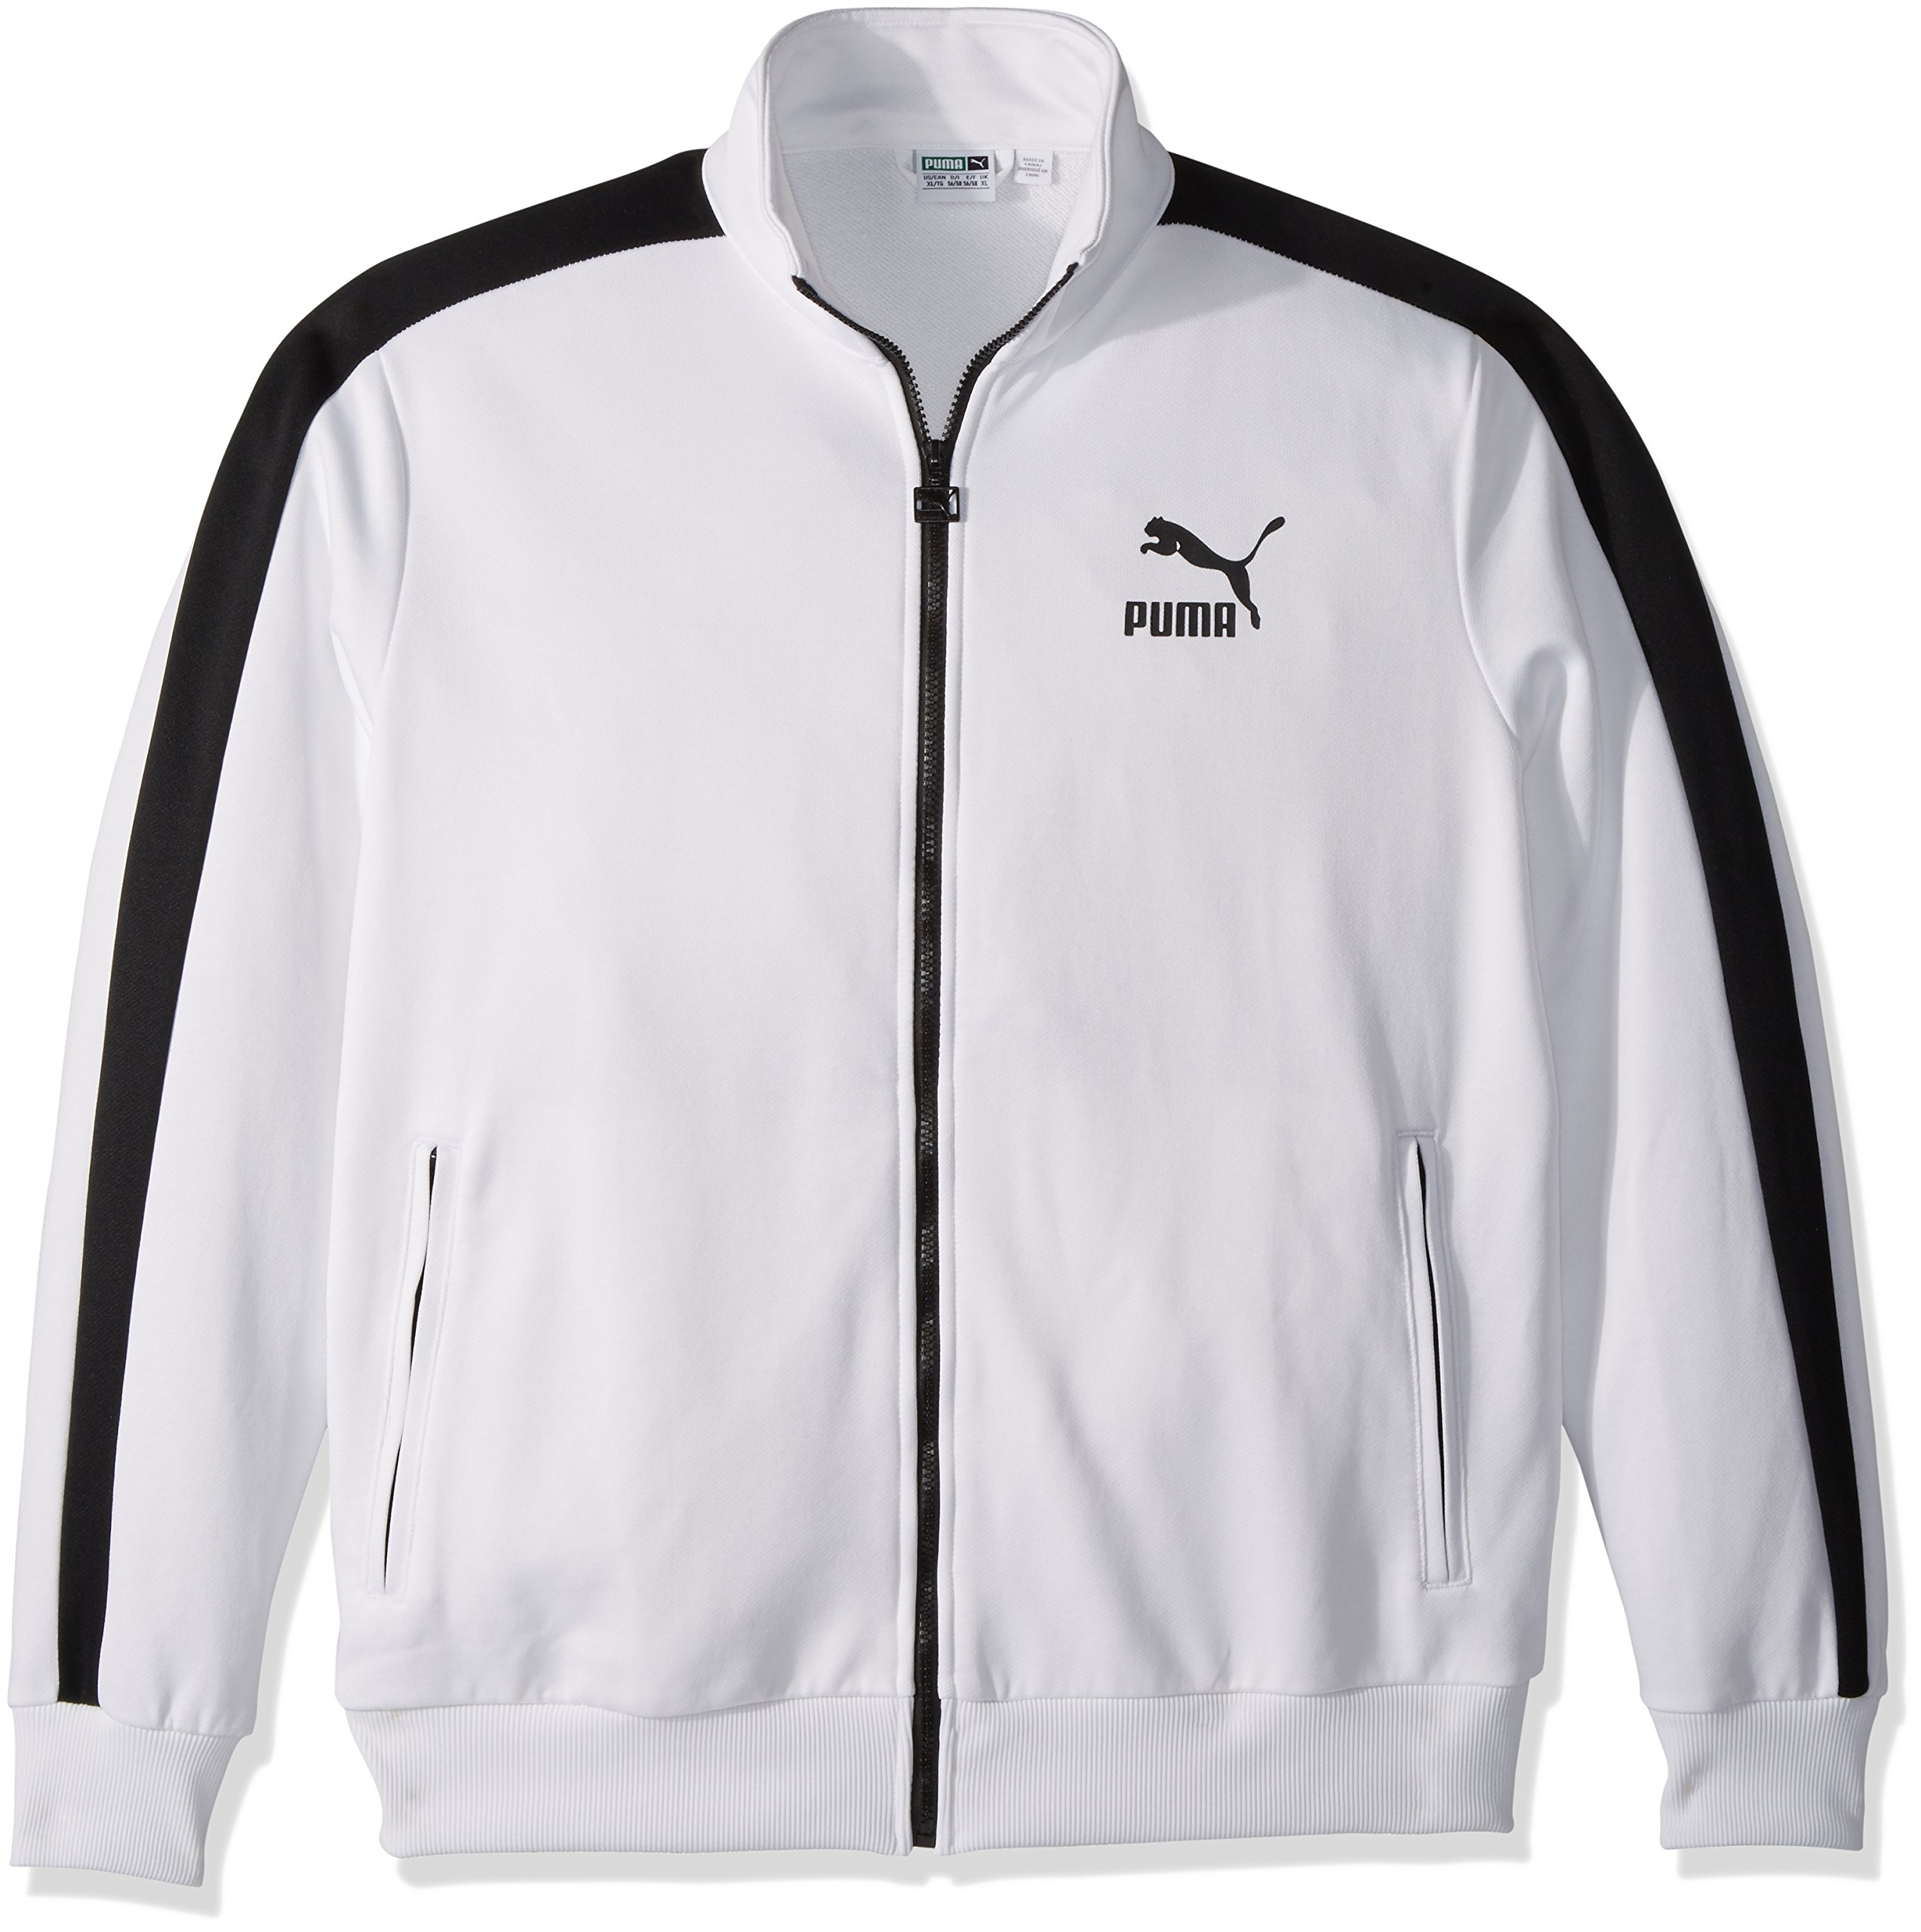 PUMA Men's Archive T7 Track Jacket, White Black, M by PUMA